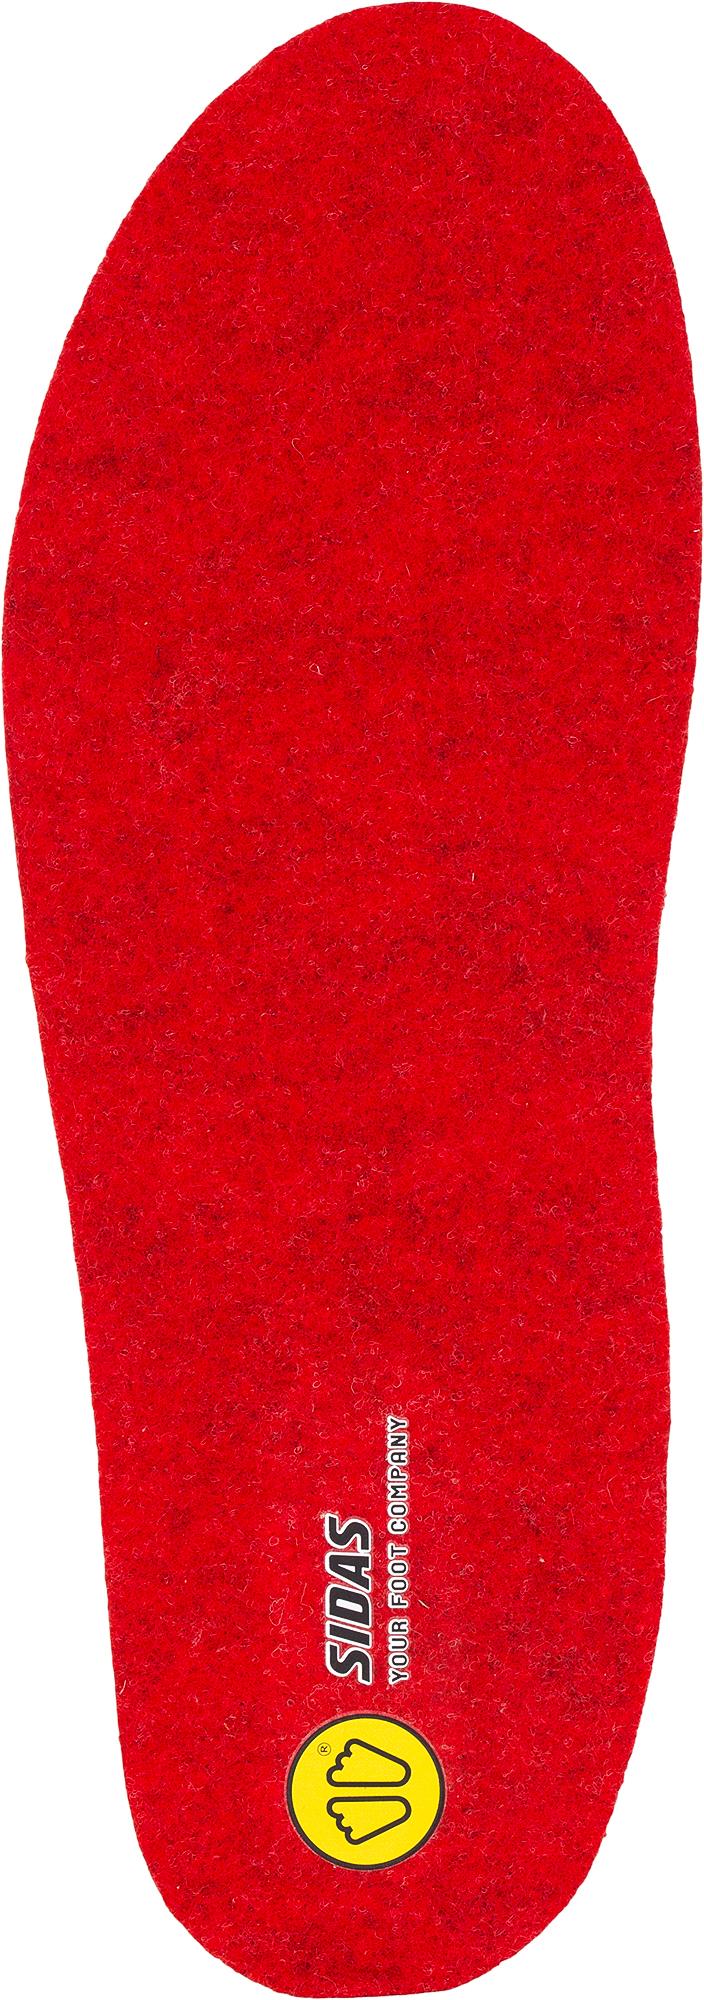 Sidas Стельки Sidas Winter C Race Merino, размер 44-45 цена 2017